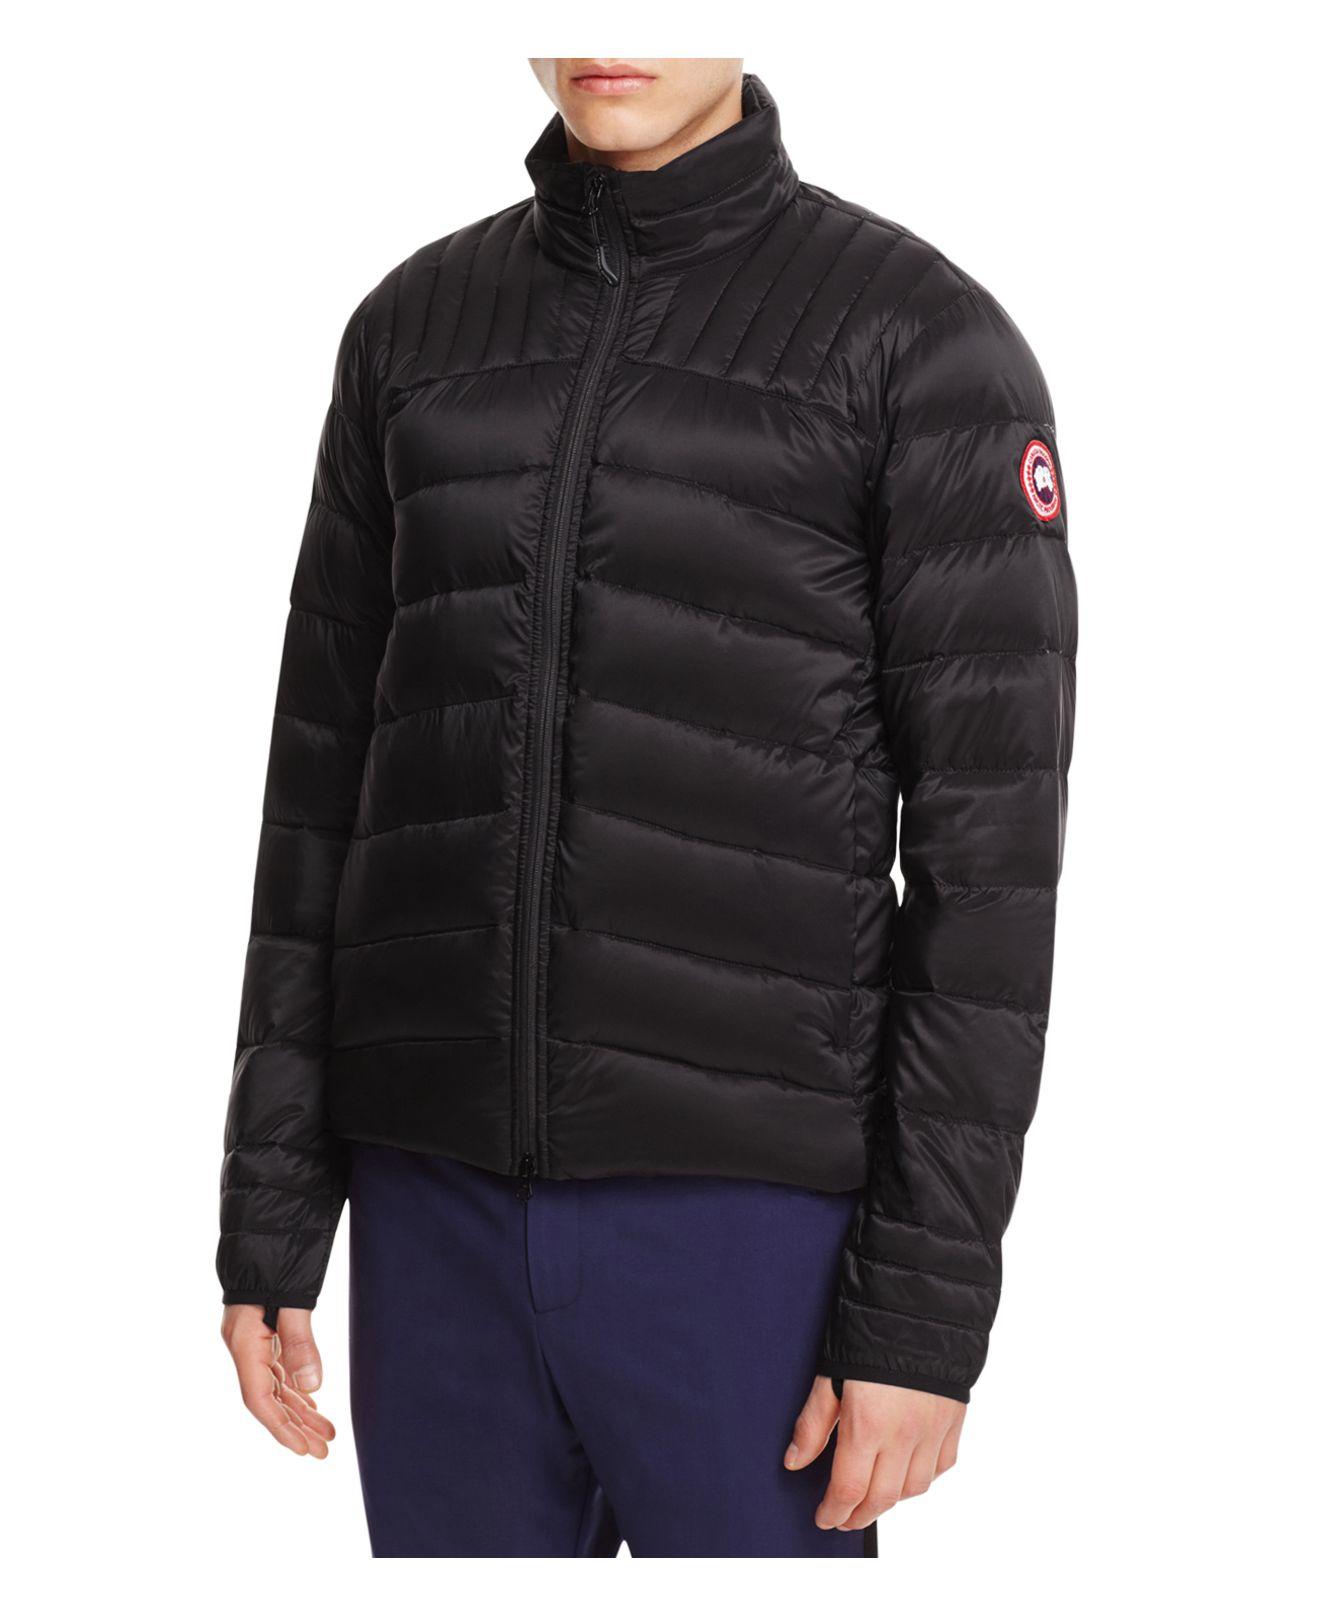 Canada Goose montebello parka sale shop - Canada goose Brookvale Down Jacket in Black for Men (Black ...